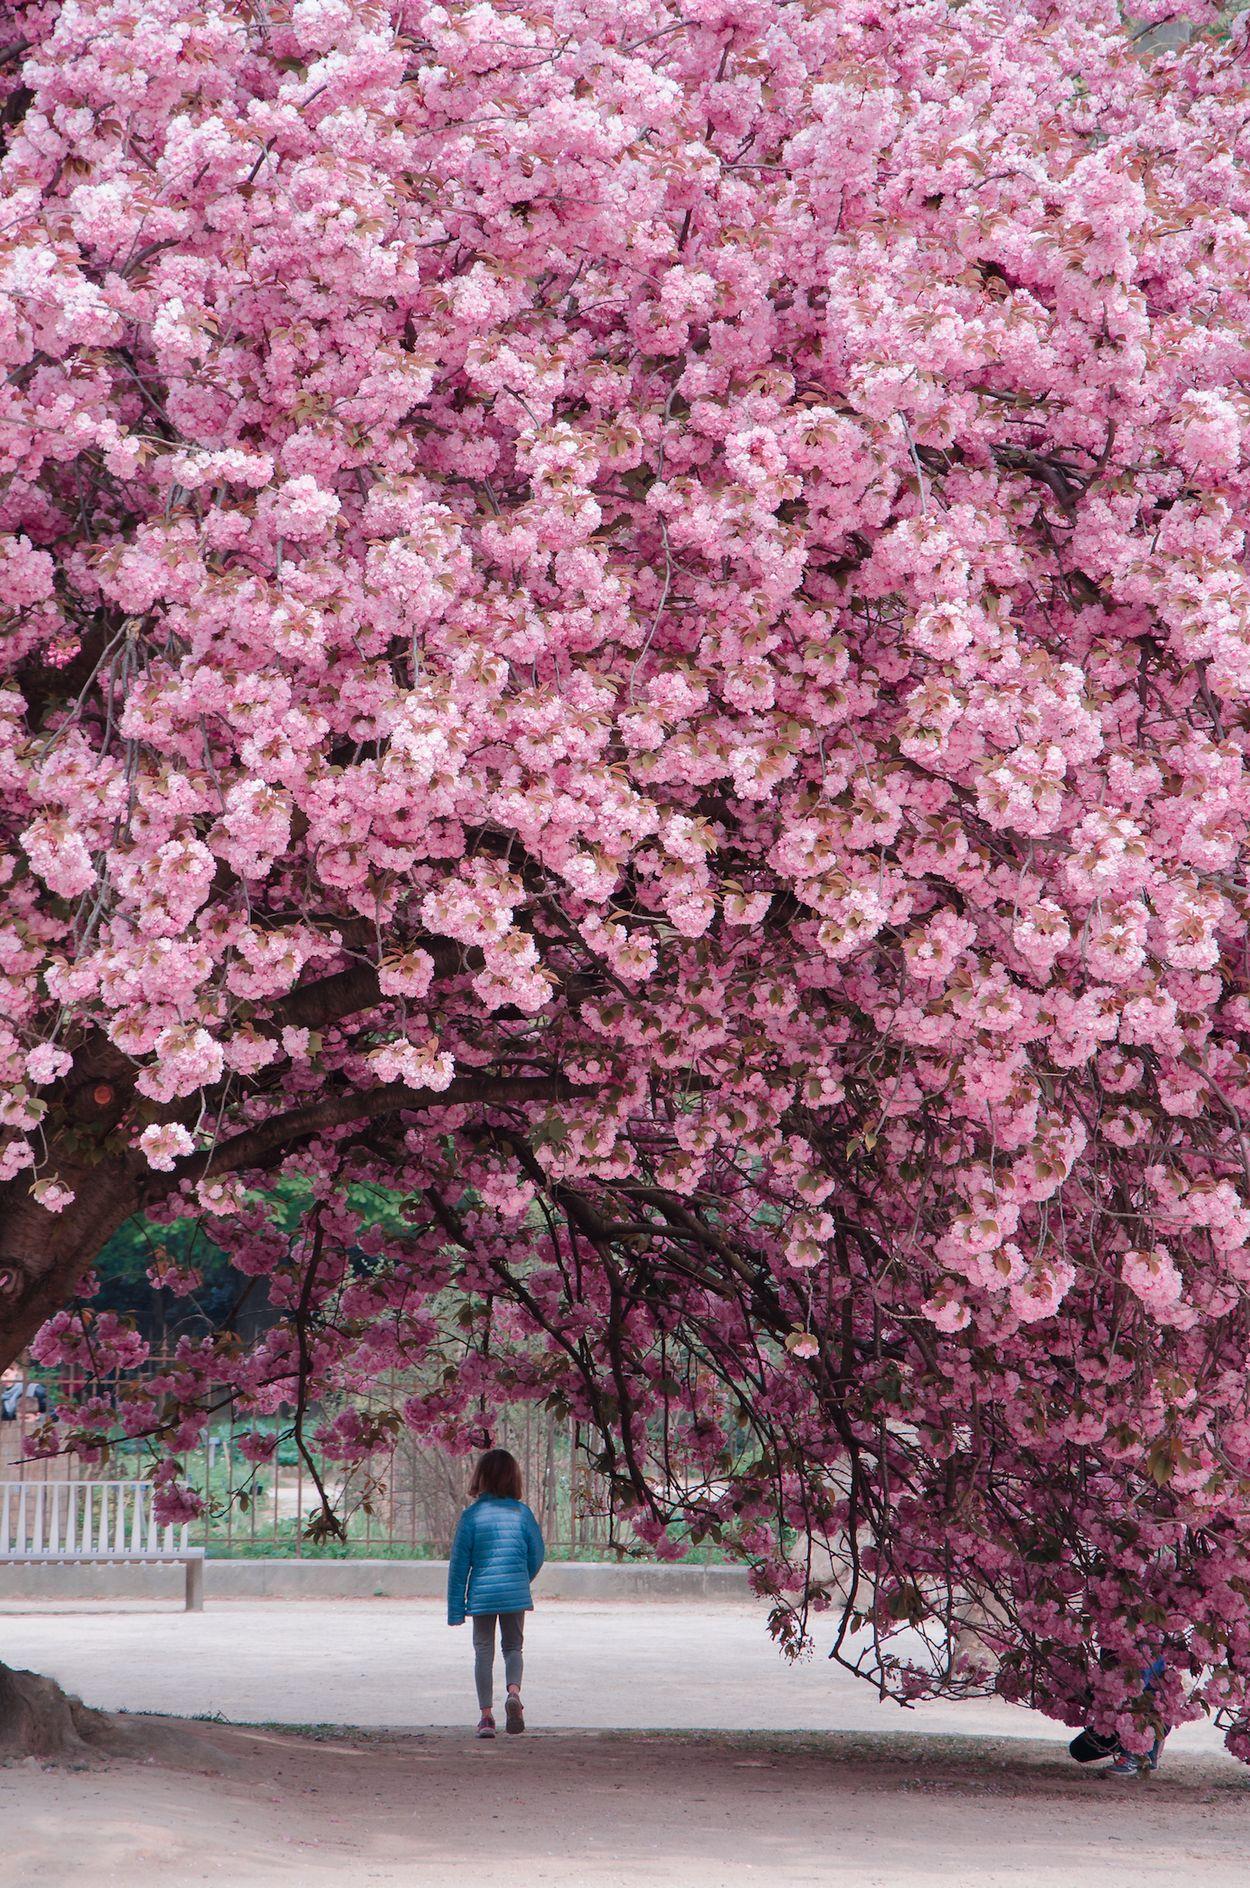 Jardin des plants Paris blossom sakura